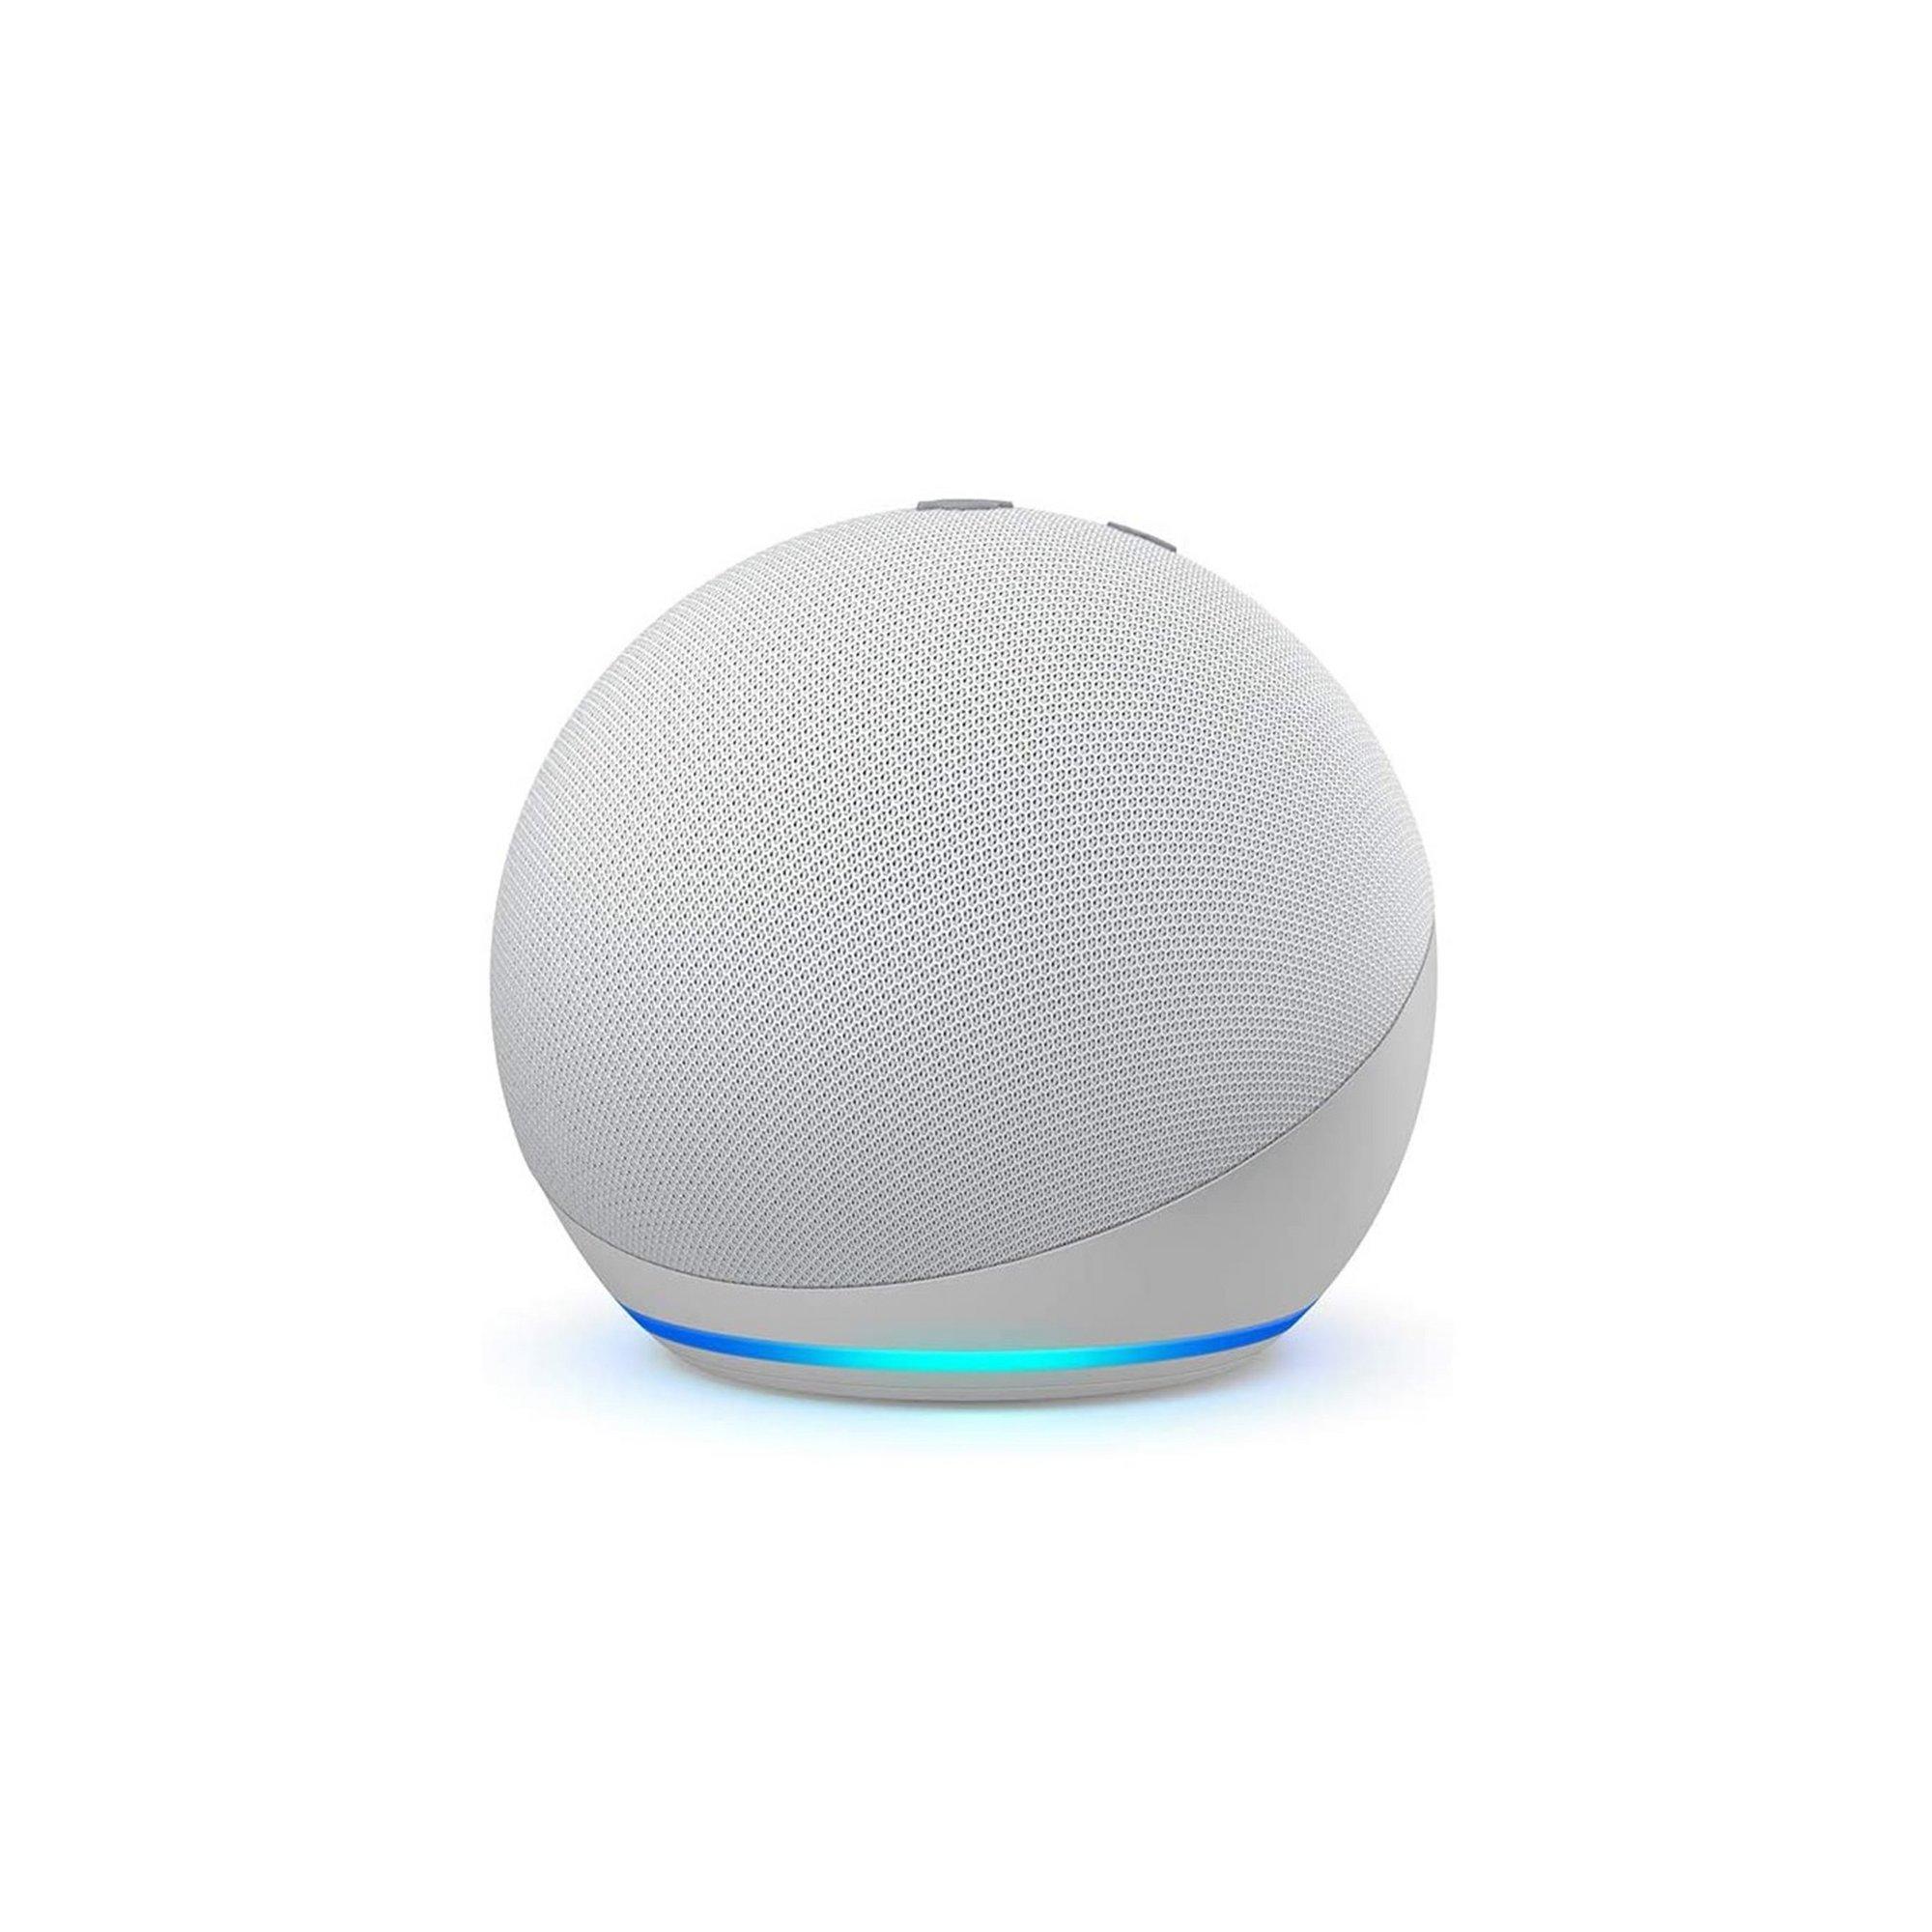 Image of Amazon All-new Echo Dot (4th generation) Smart Speaker with Alexa